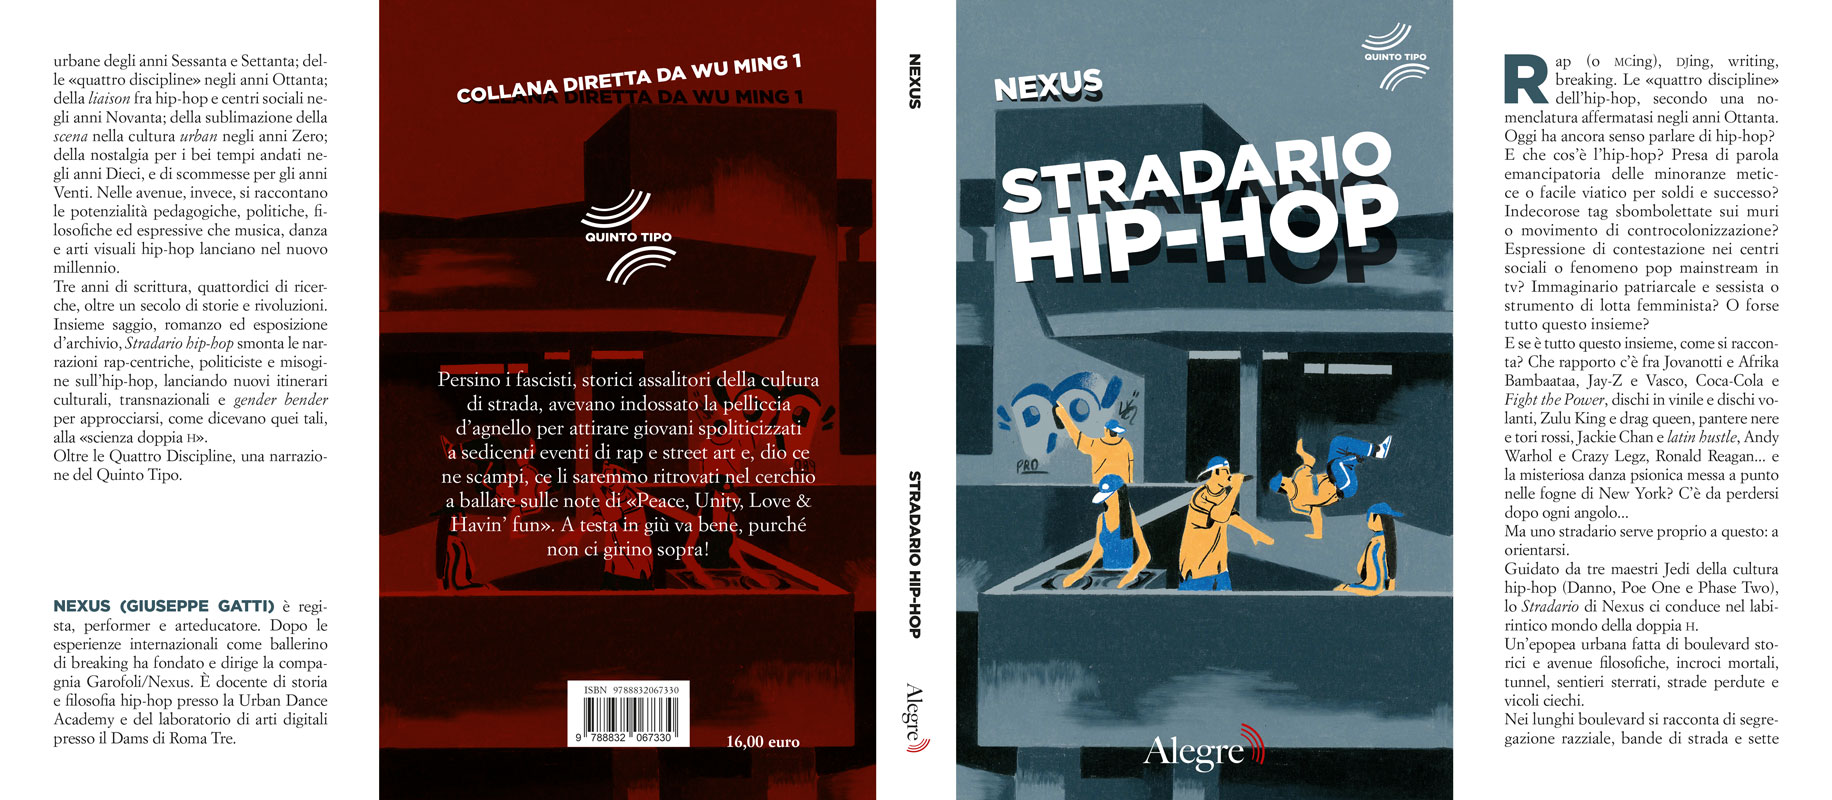 Stradario_hip-hop_copertina_stesa